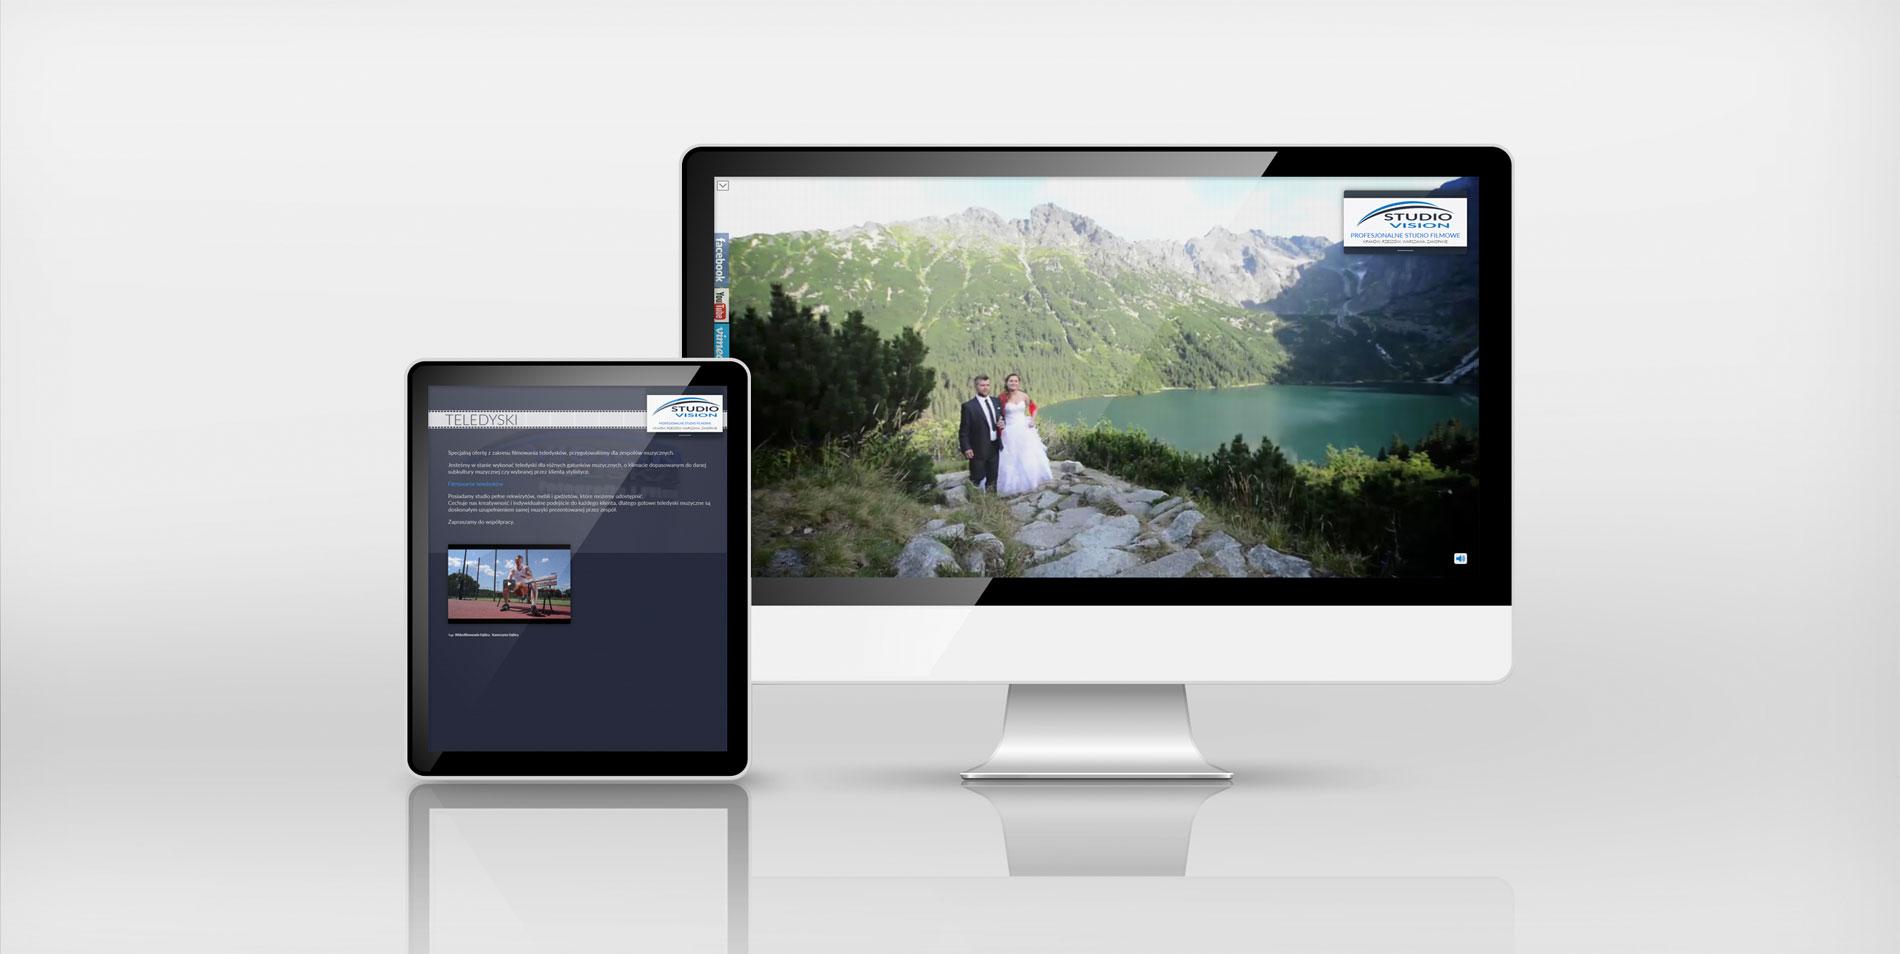 Wideofilmowanie / <span>Studio Vision</span>